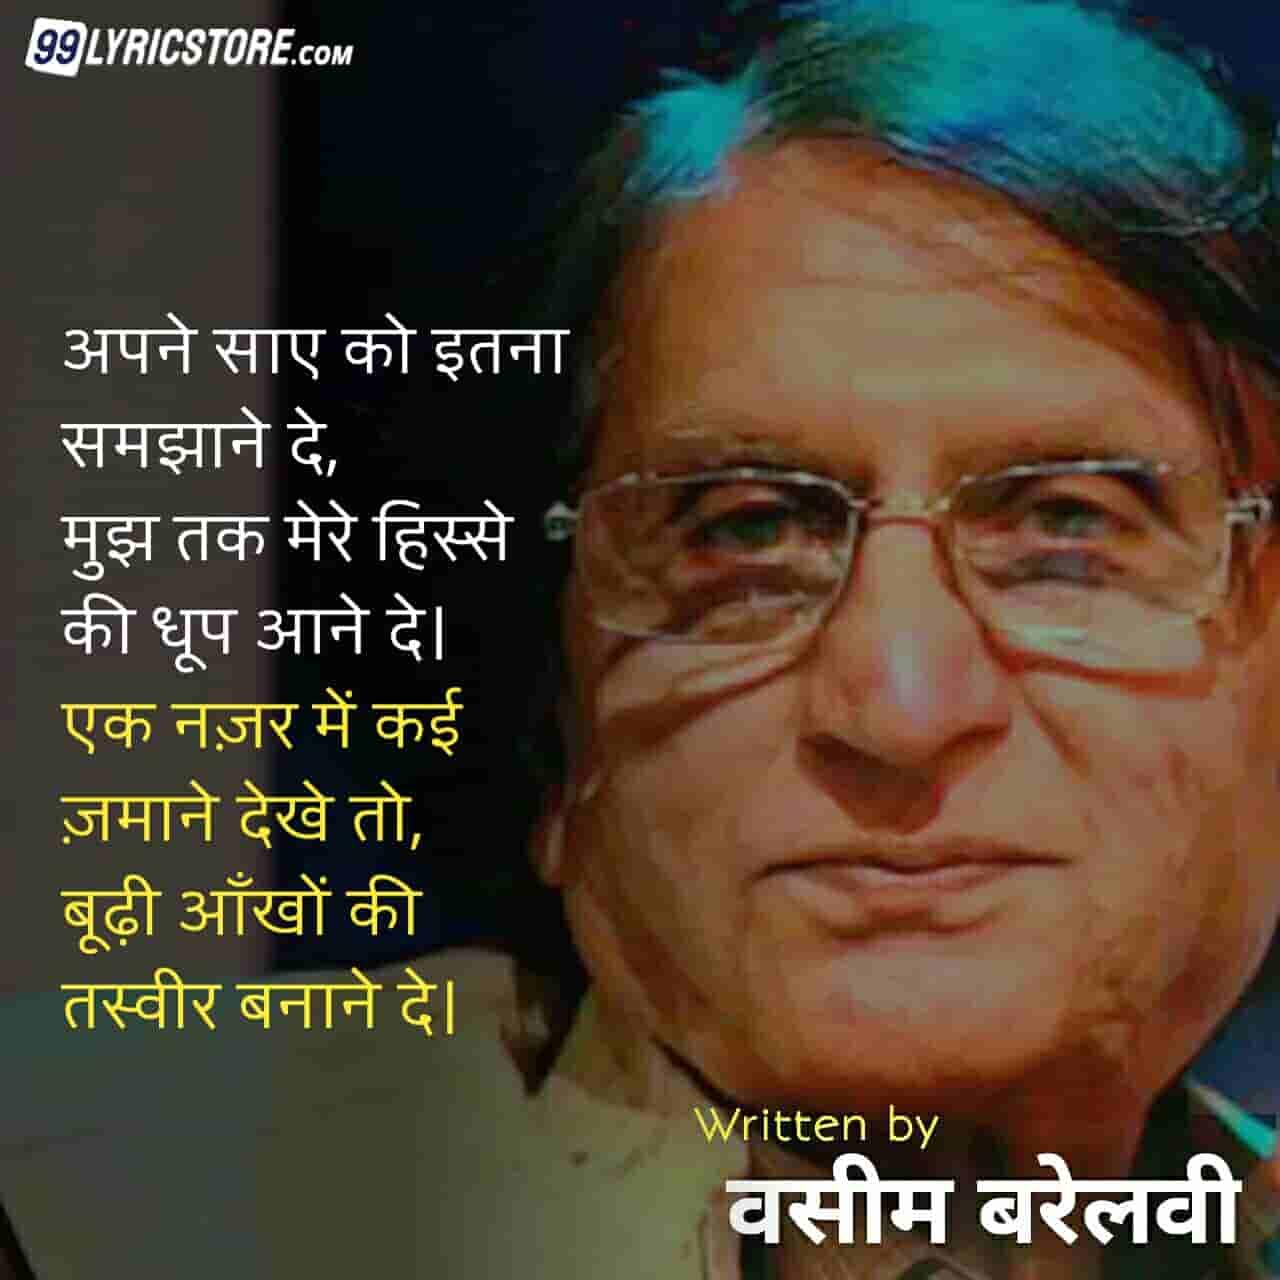 This beautiful Ghazal 'Apne Saaye Ko Itna Samjhaane De' has written by Waseem Barelvi.